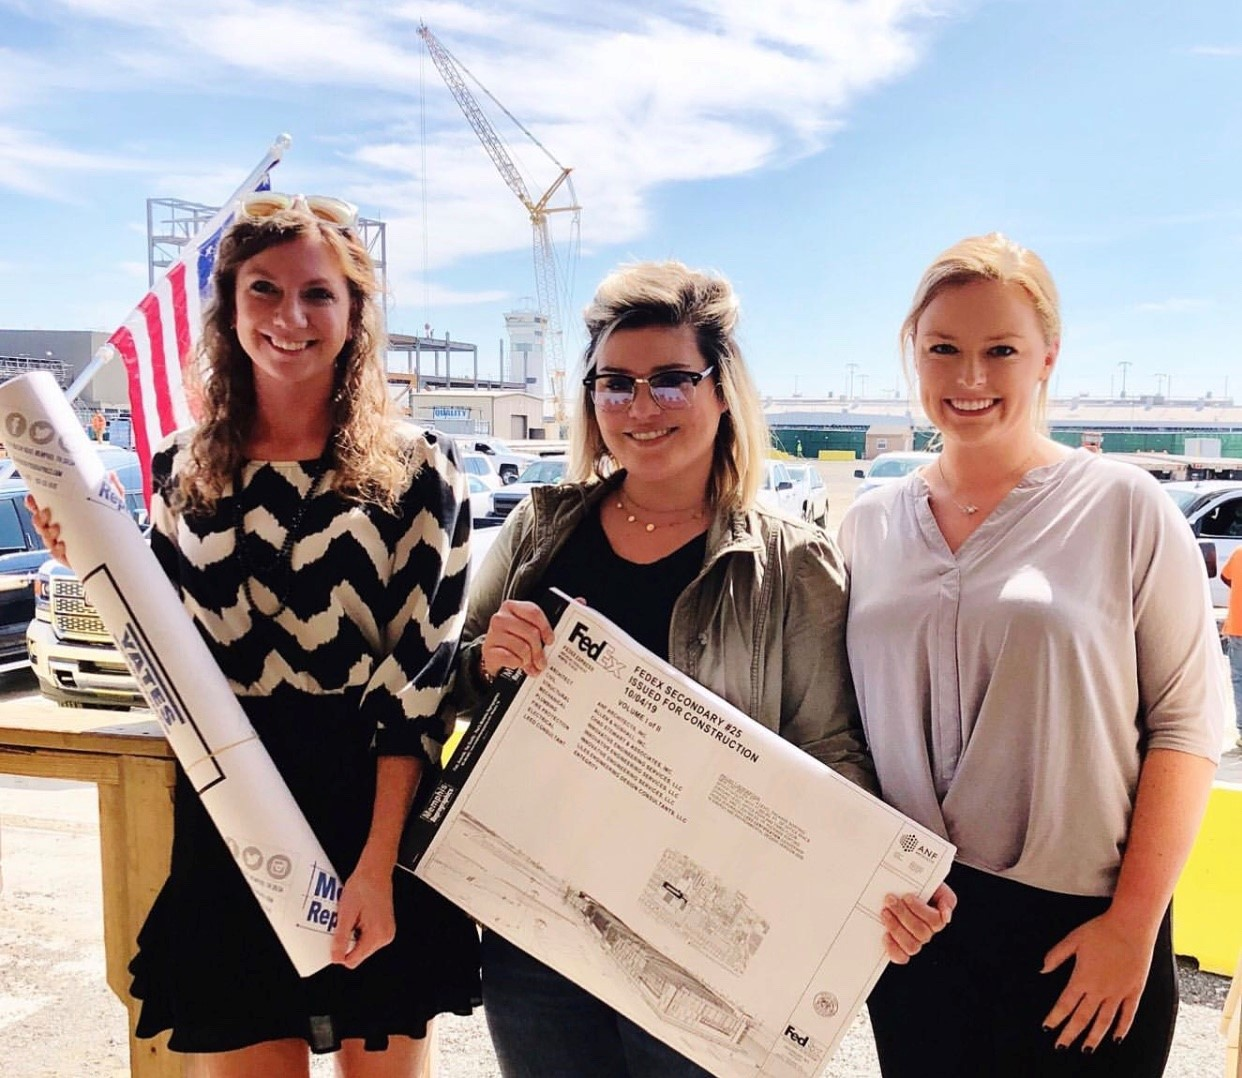 FedEx Jobsite, Yates Construction, Women in Construction